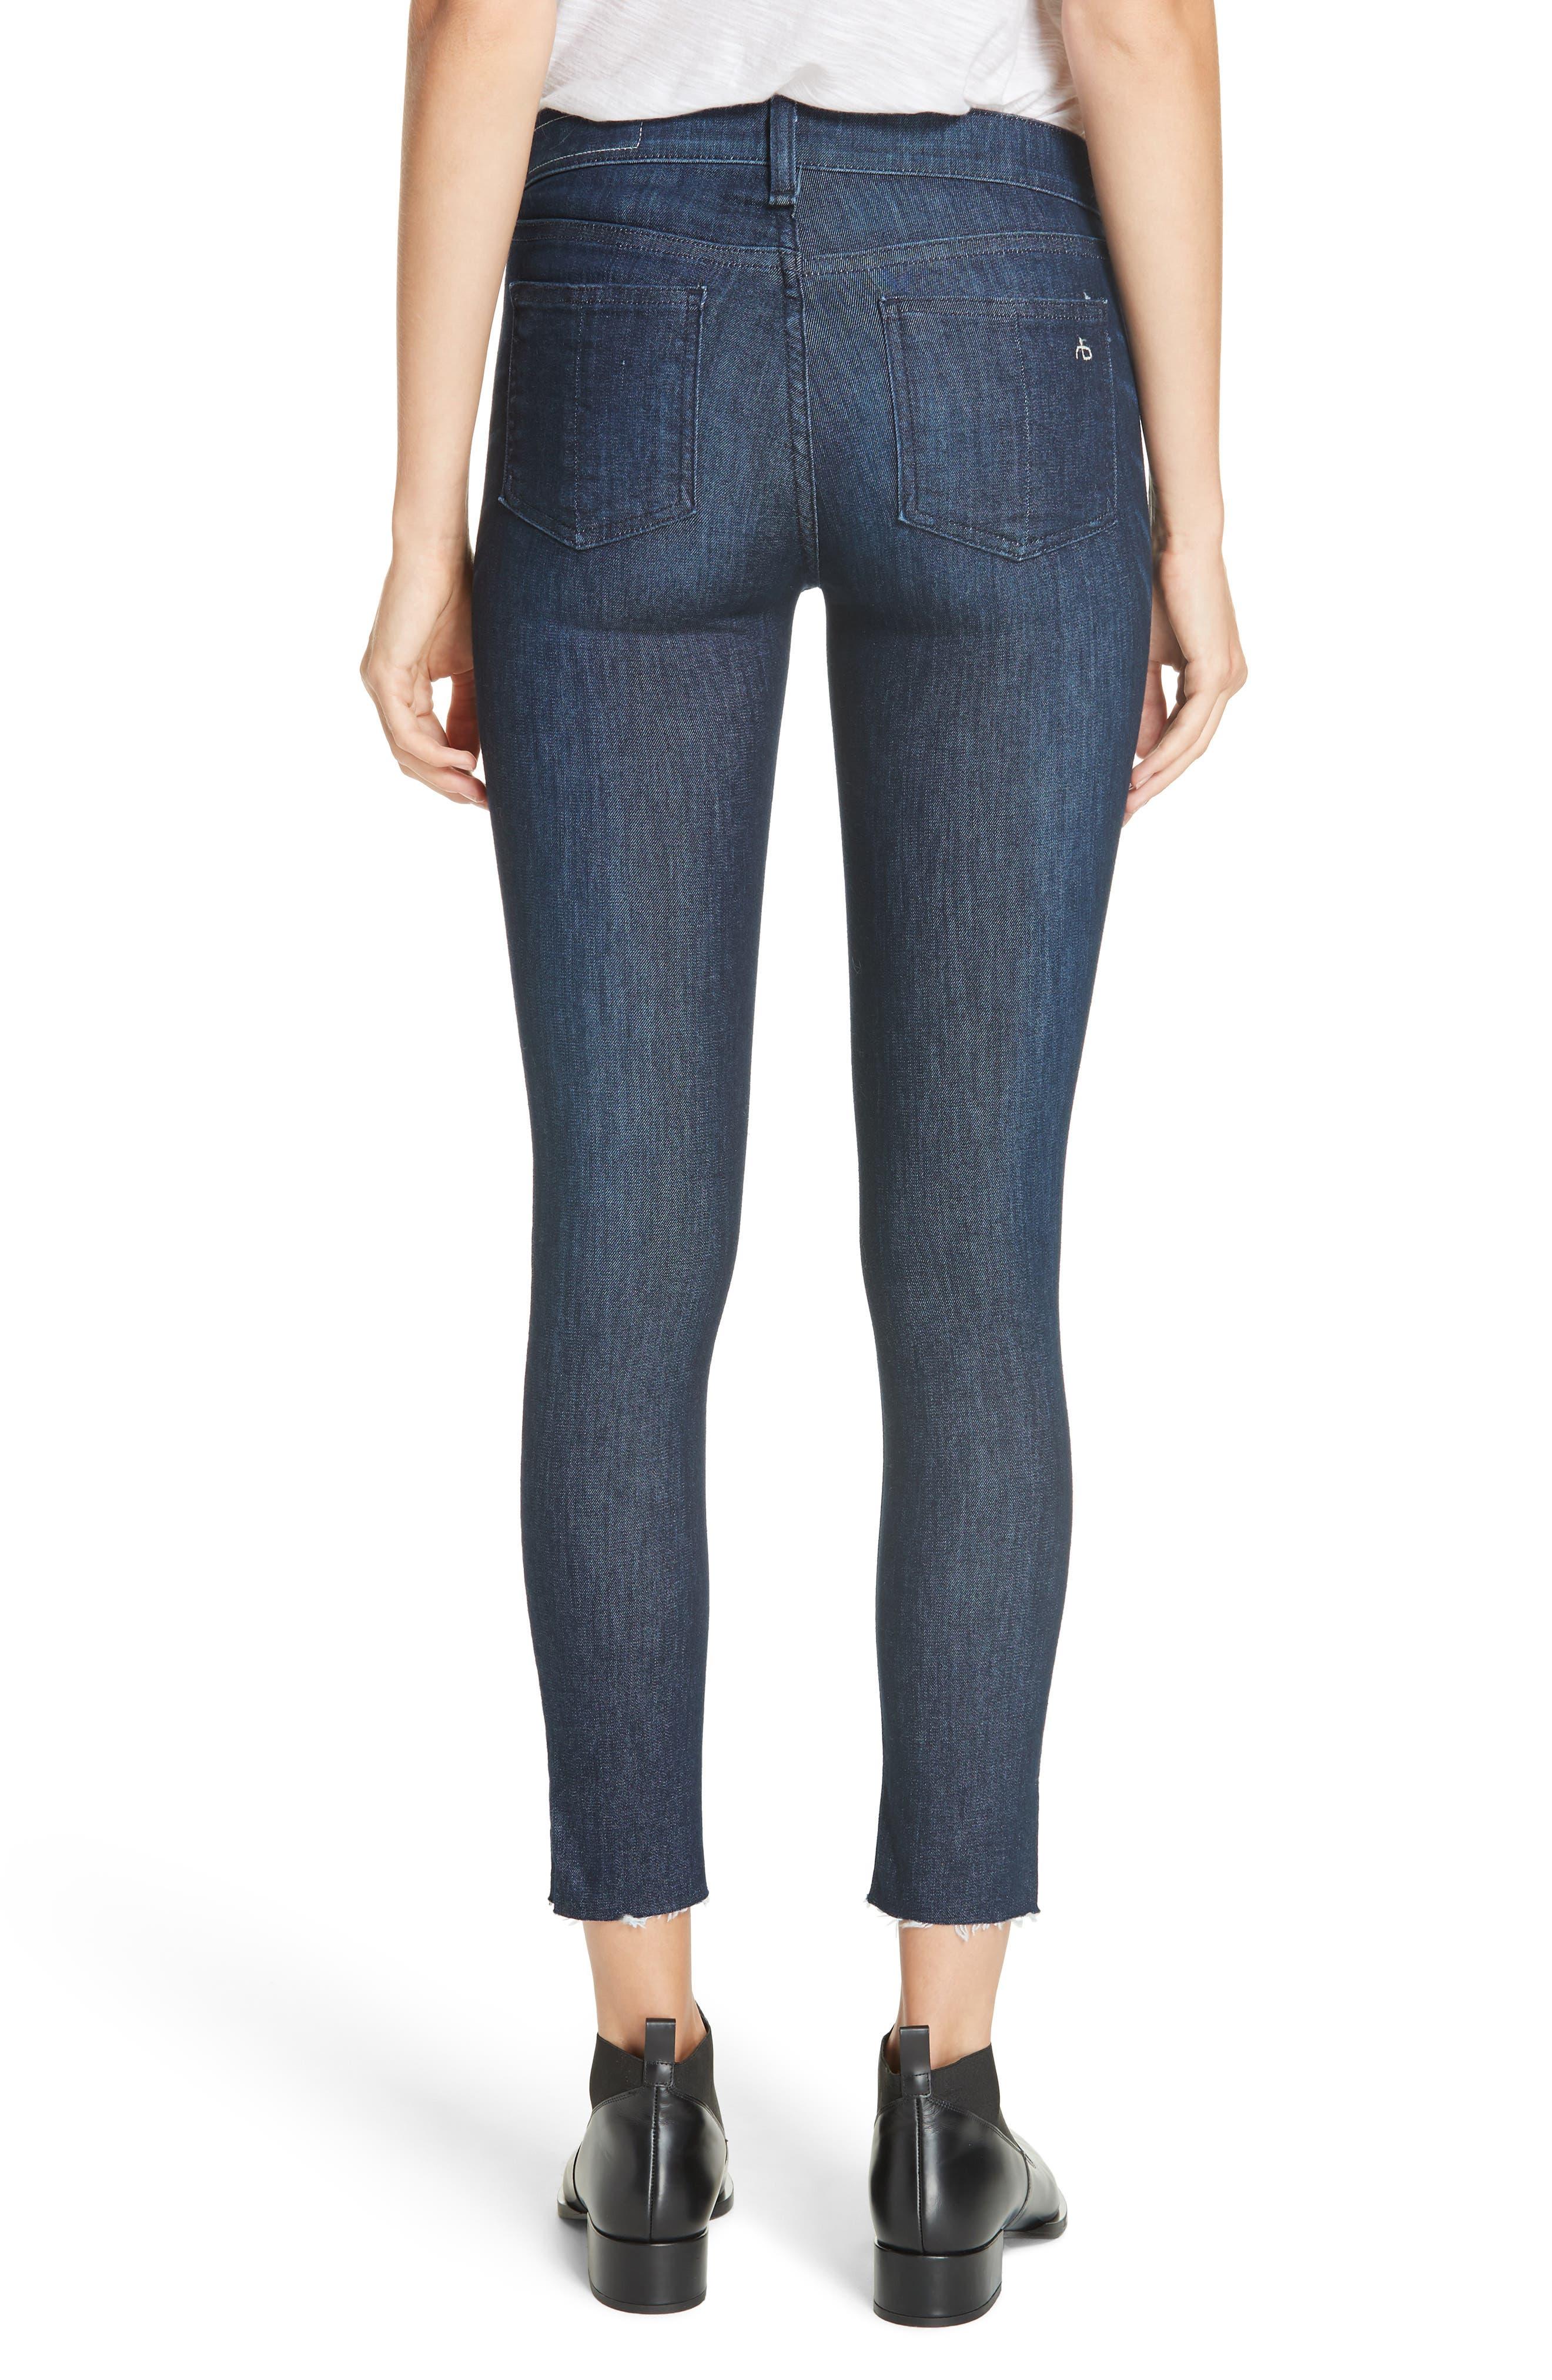 RAG & BONE, Raw Hem Ankle Skinny Jeans, Alternate thumbnail 2, color, TONAL RIVER